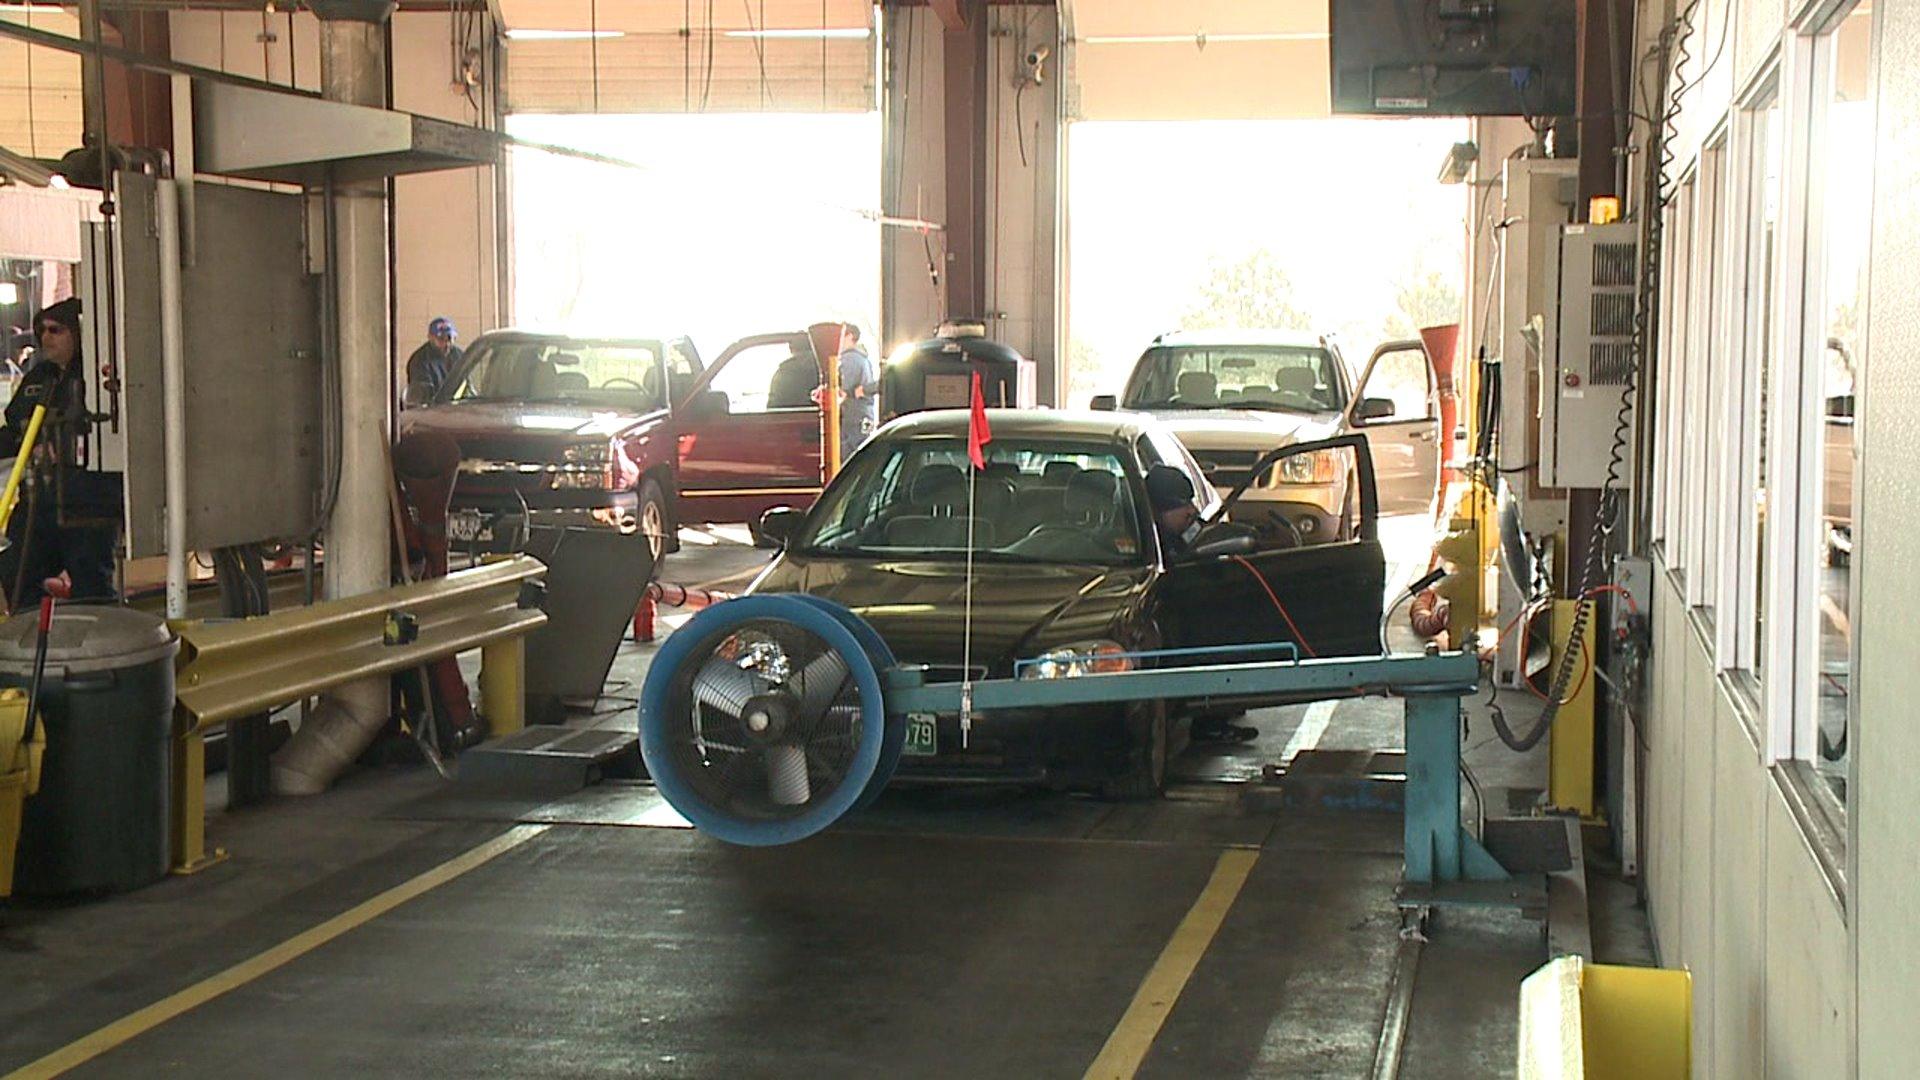 ar tested in Colorado auto emissions program